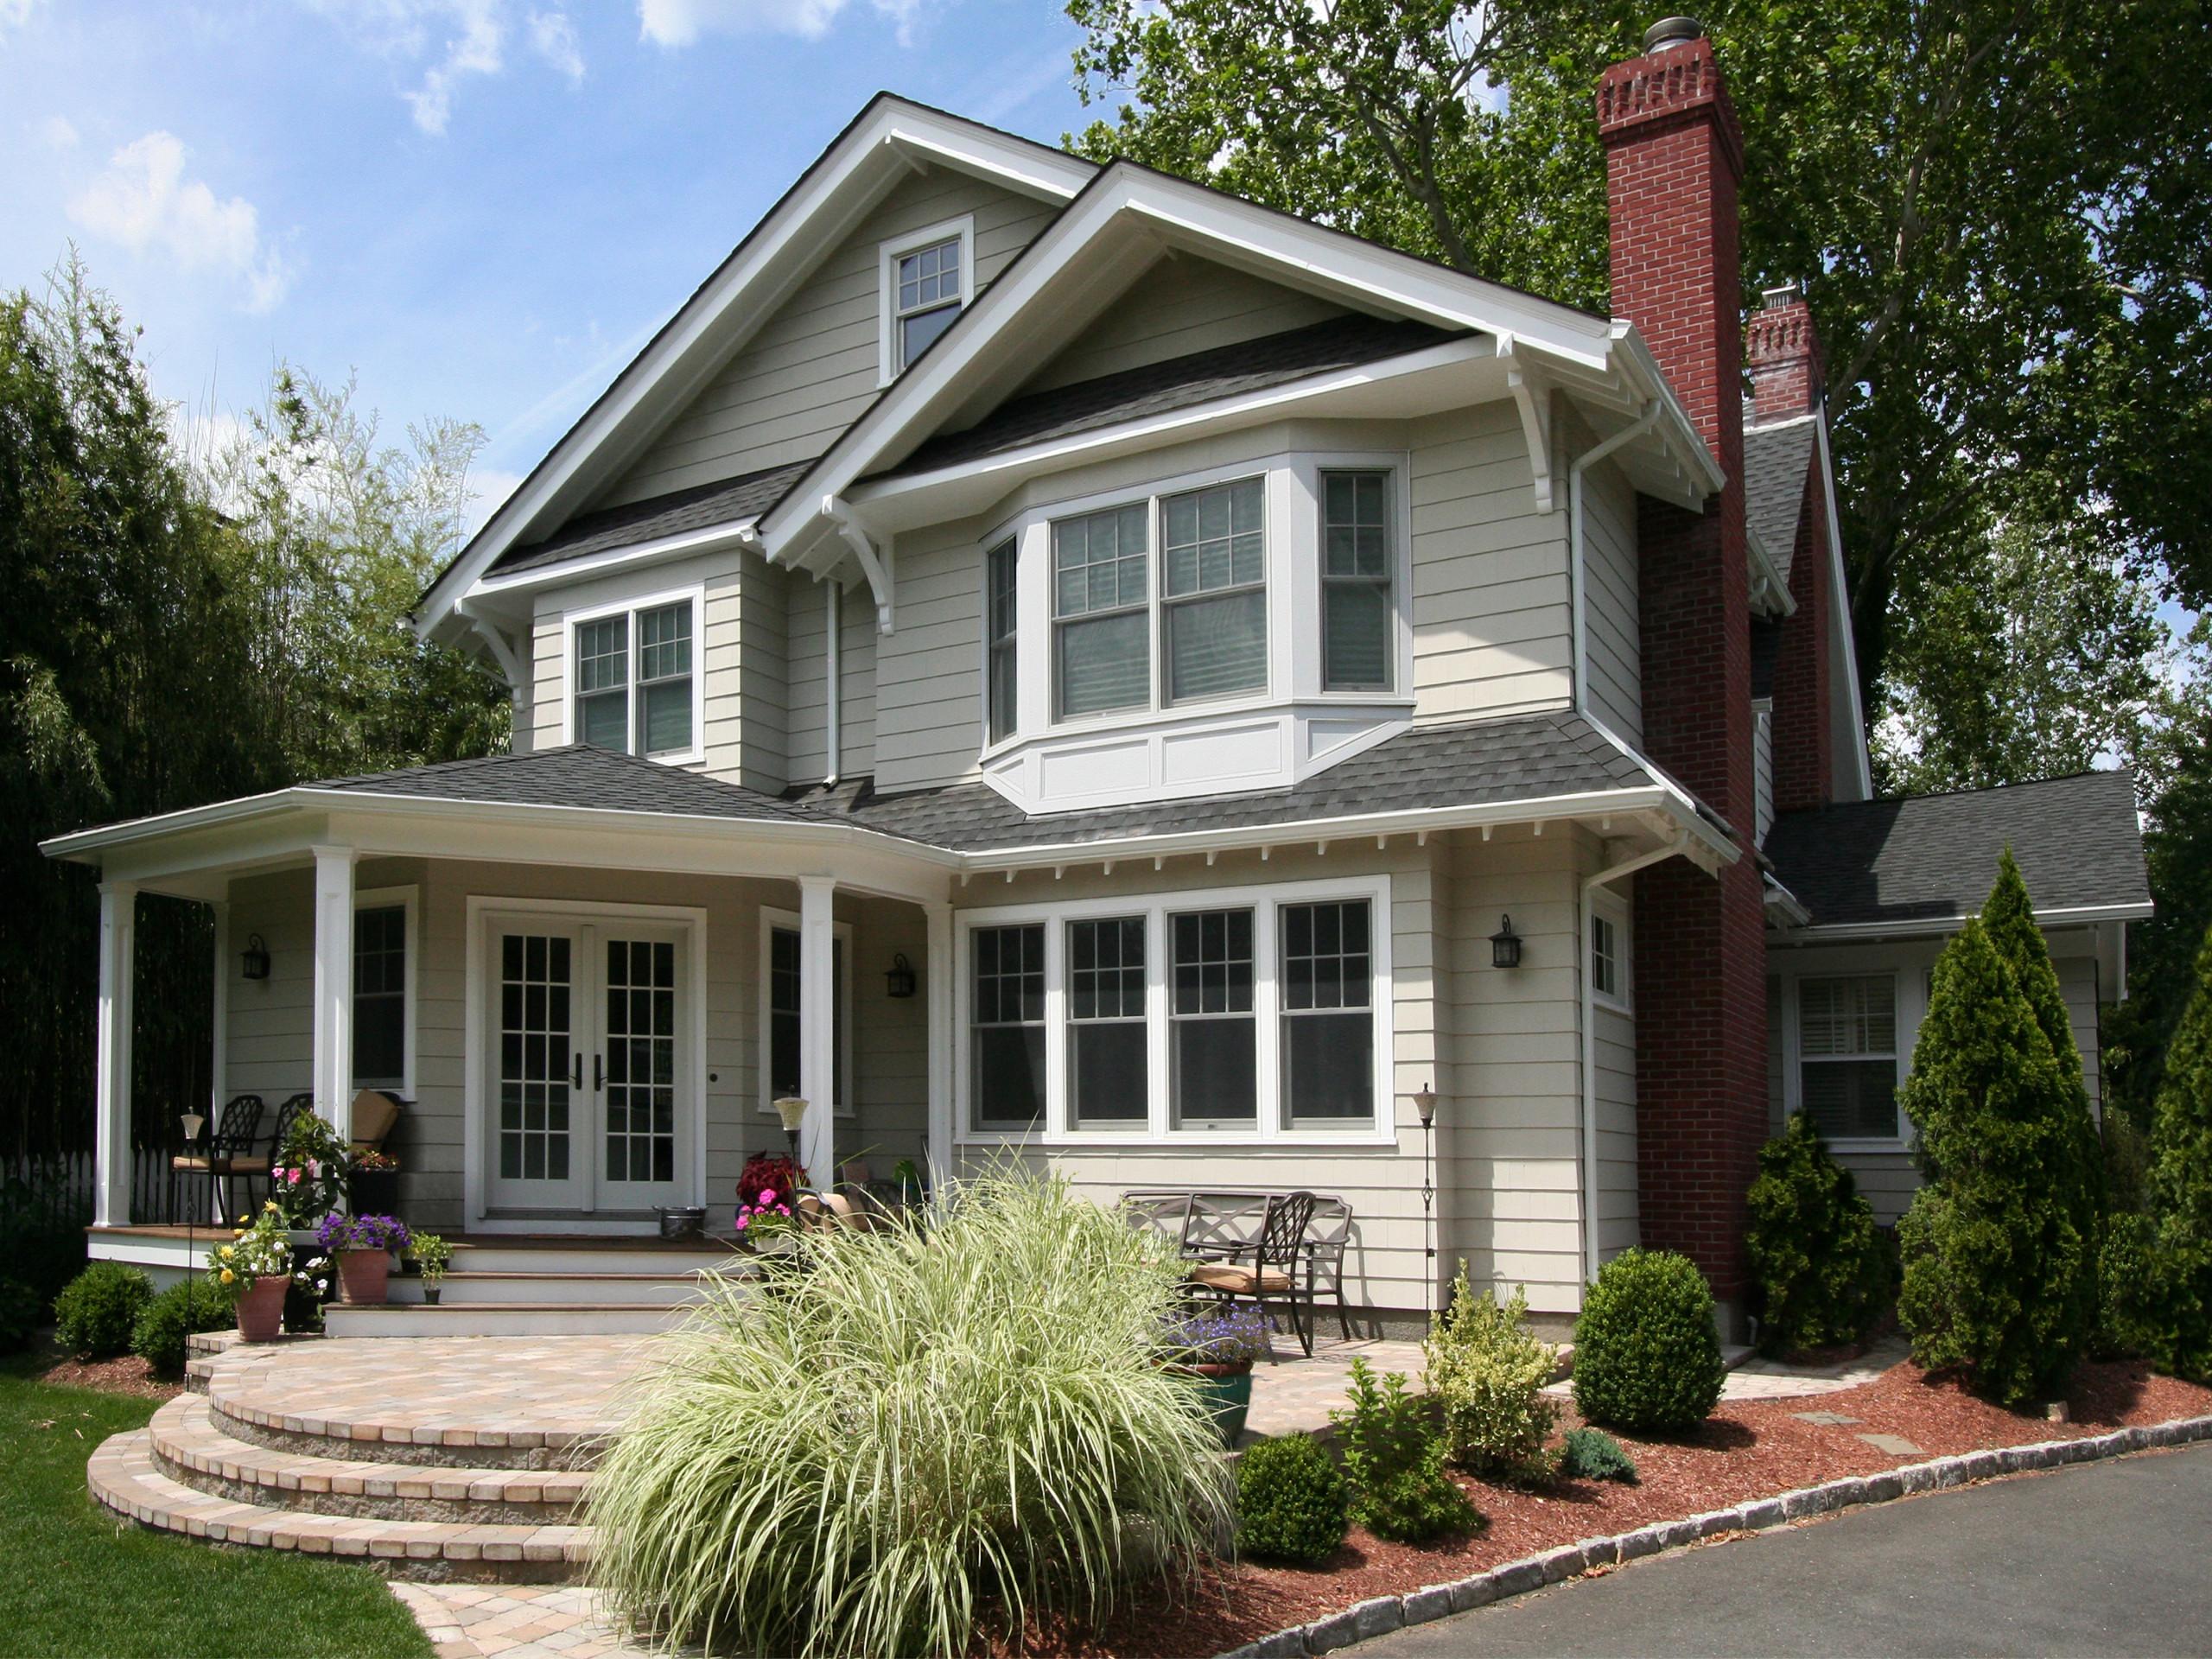 Private Residence - Ridgewood, NJ